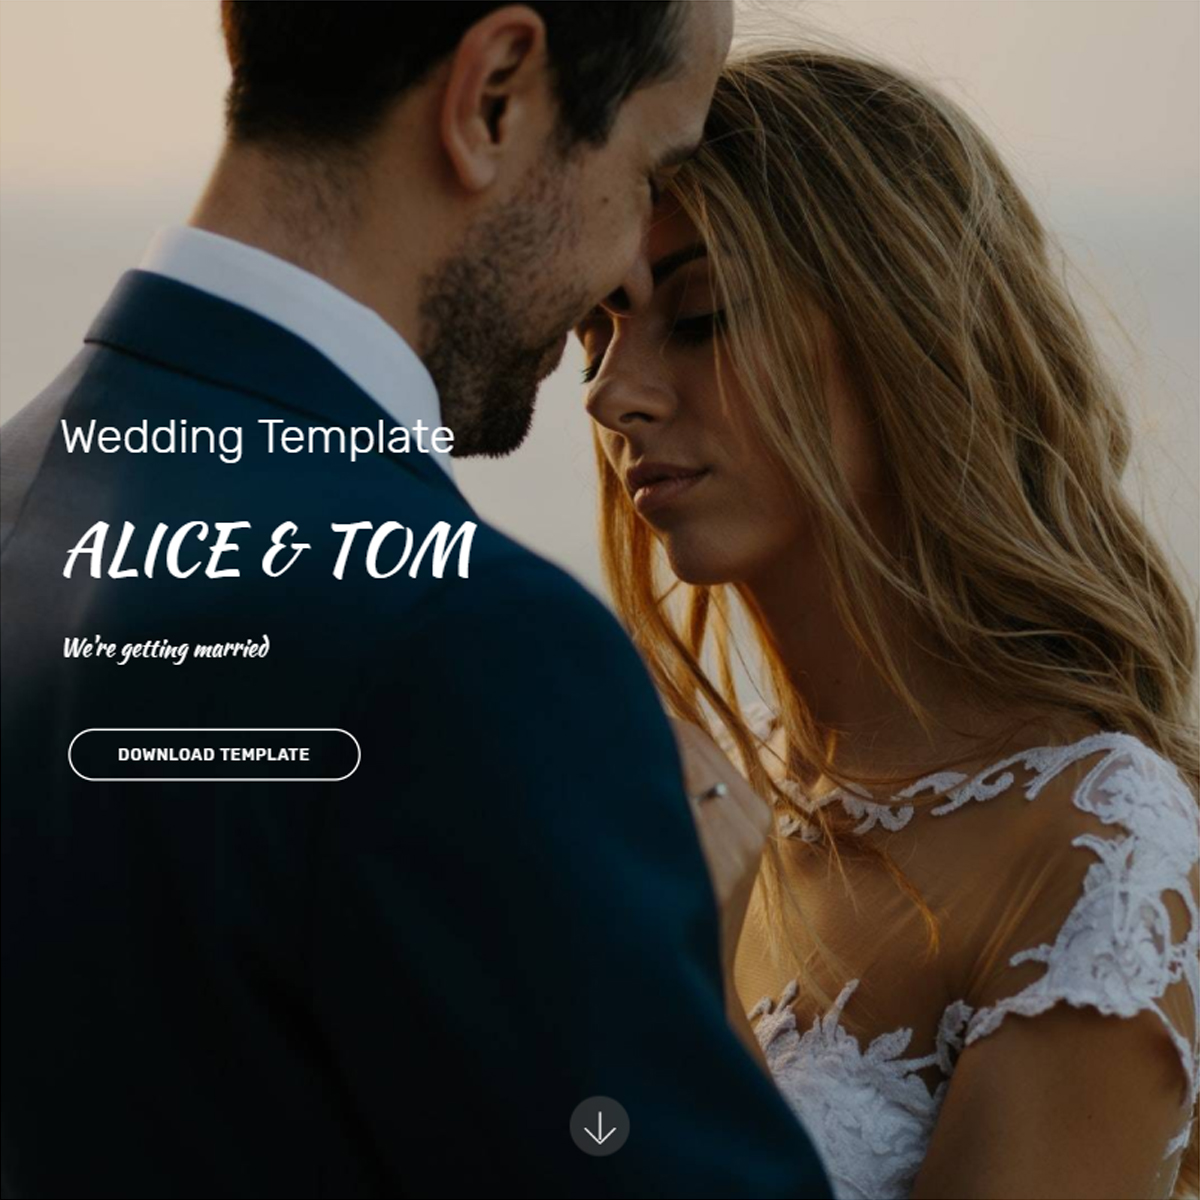 Free Bootstrap Wedding Templates